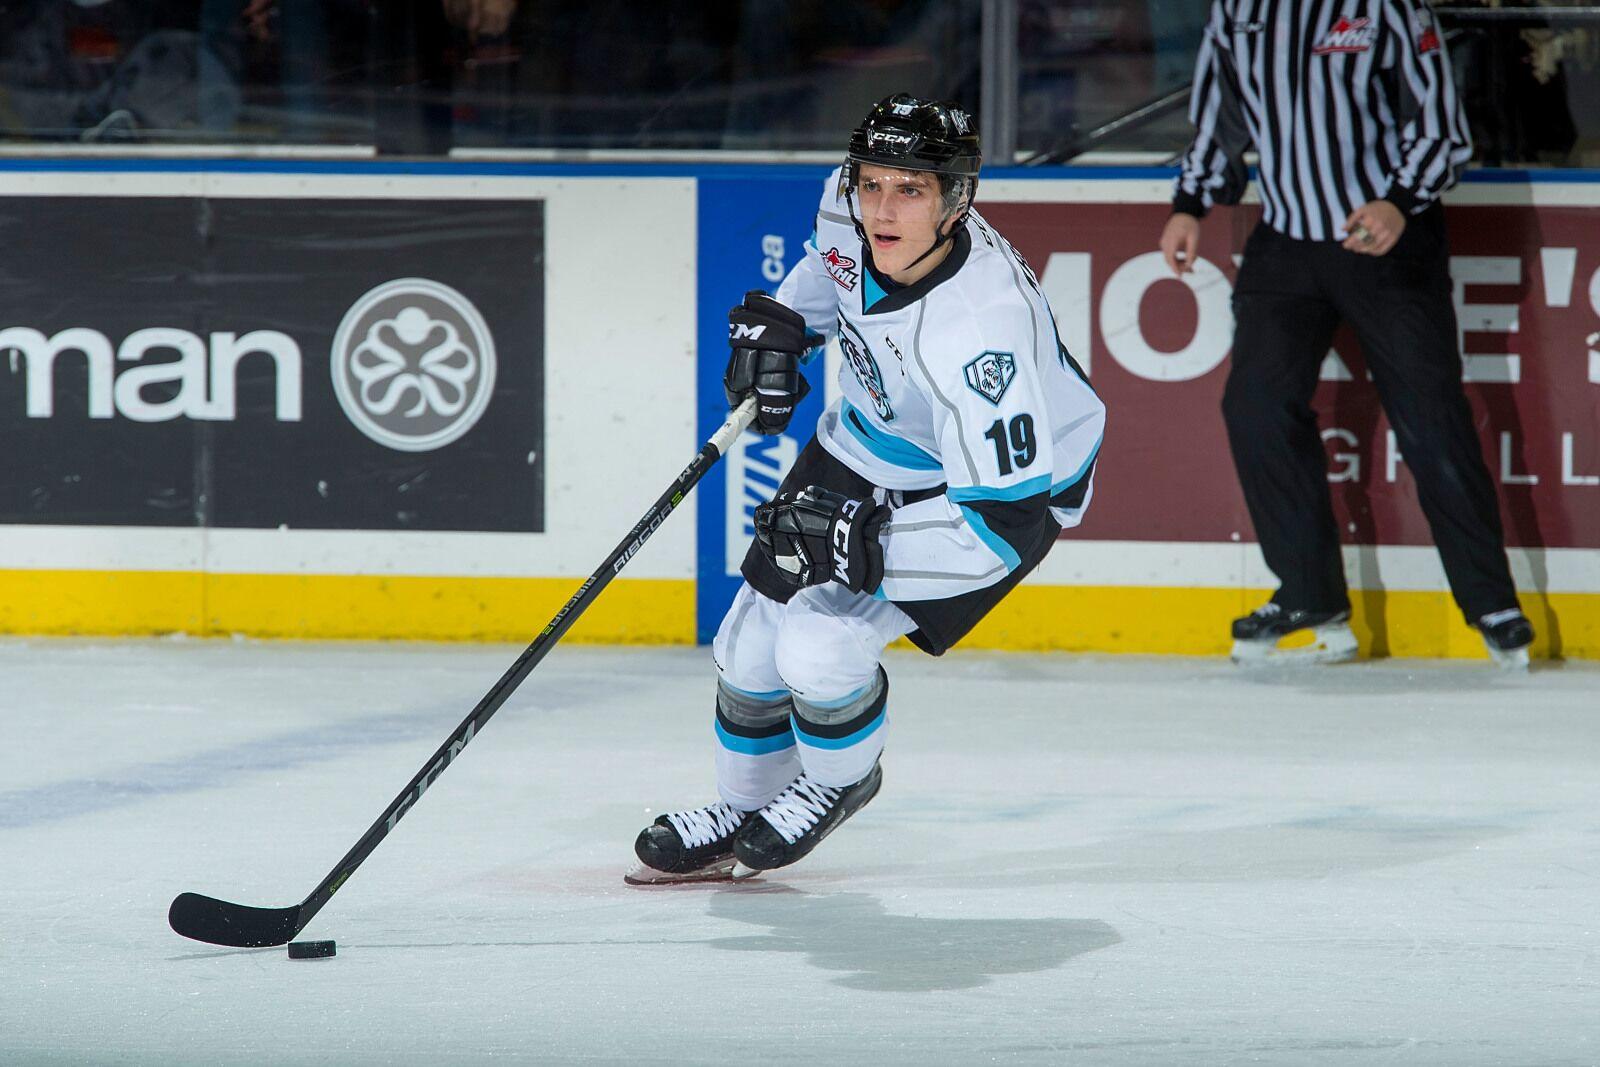 2019 NHL draft prospect profile: Is Peyton Krebs the Next Bo Horvat?